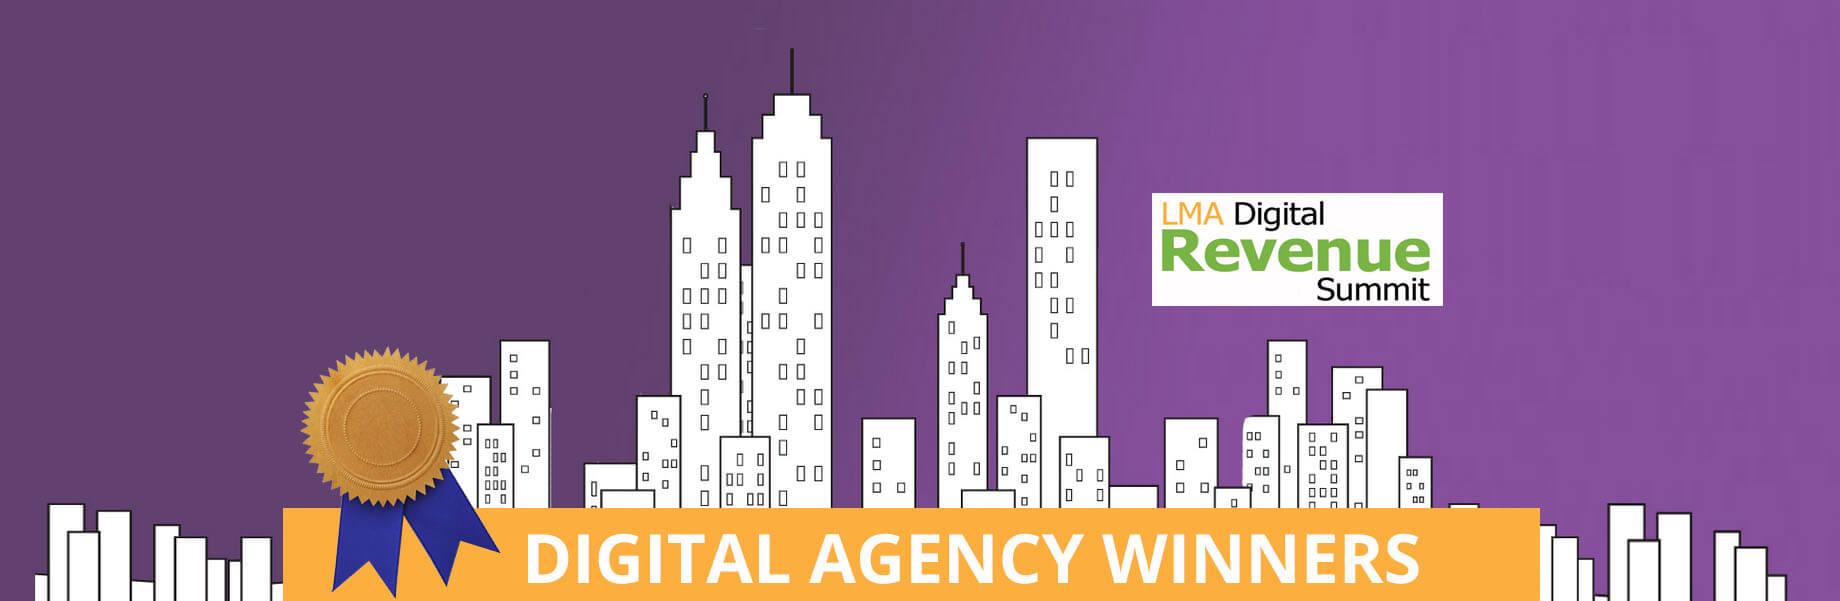 LMA digital agency winner